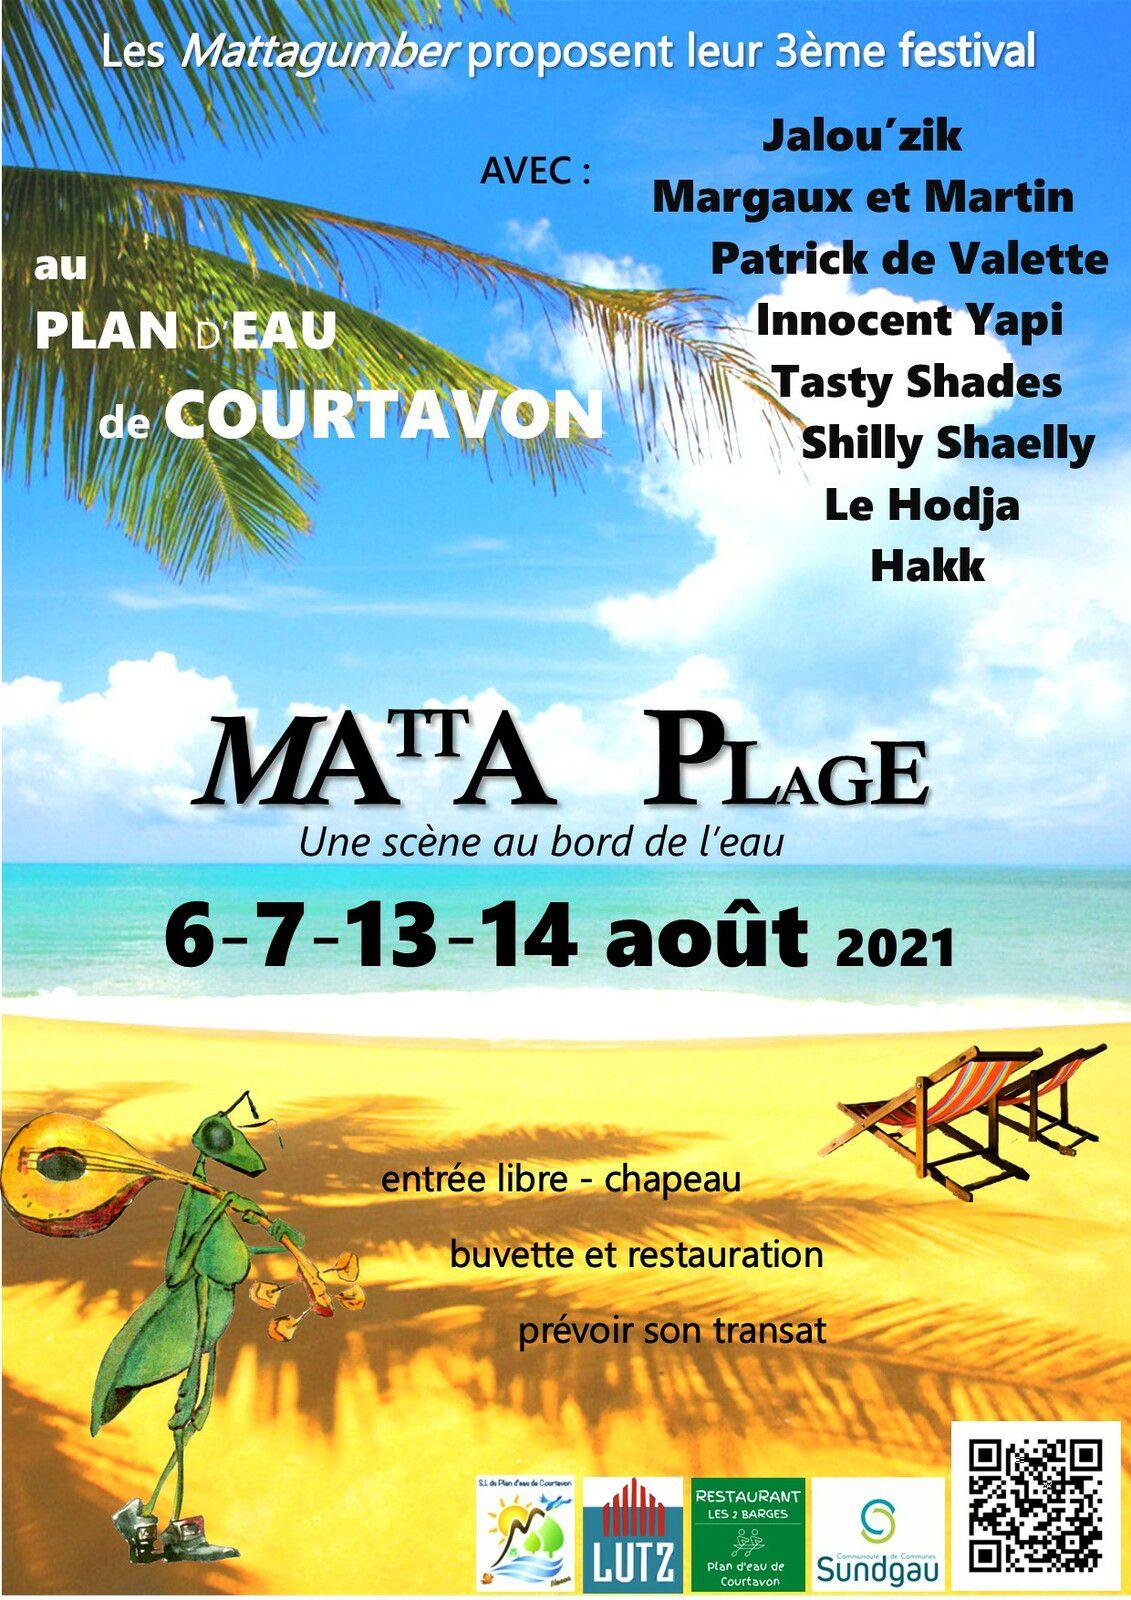 Matta Plage 2021 - Mattagumber - Plan d'eau de Courtavon